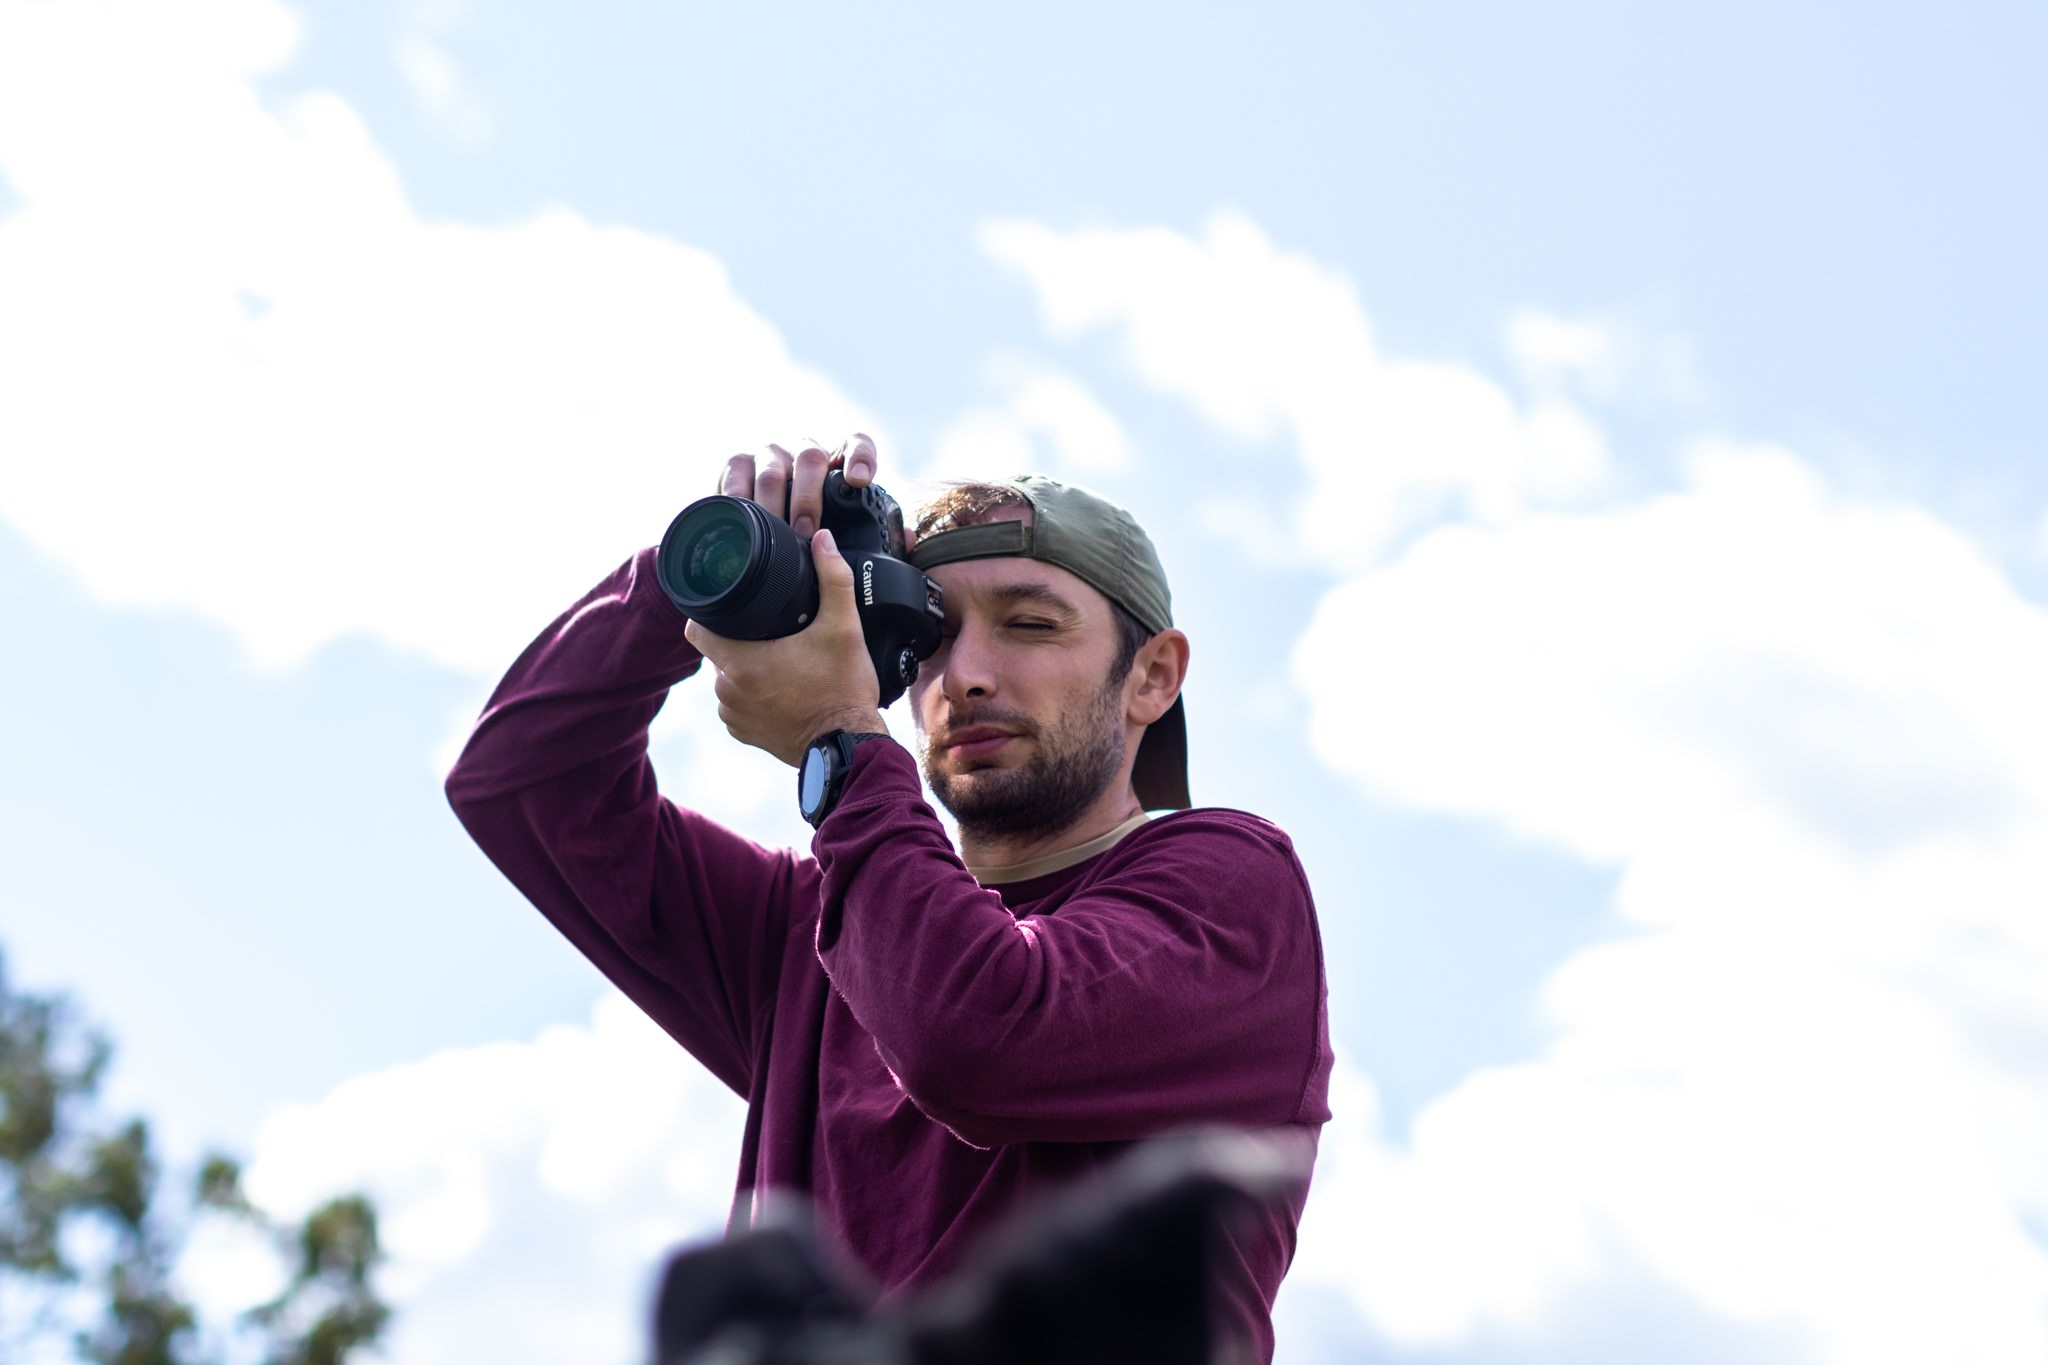 Capturing Moments by Gaven Schmidt